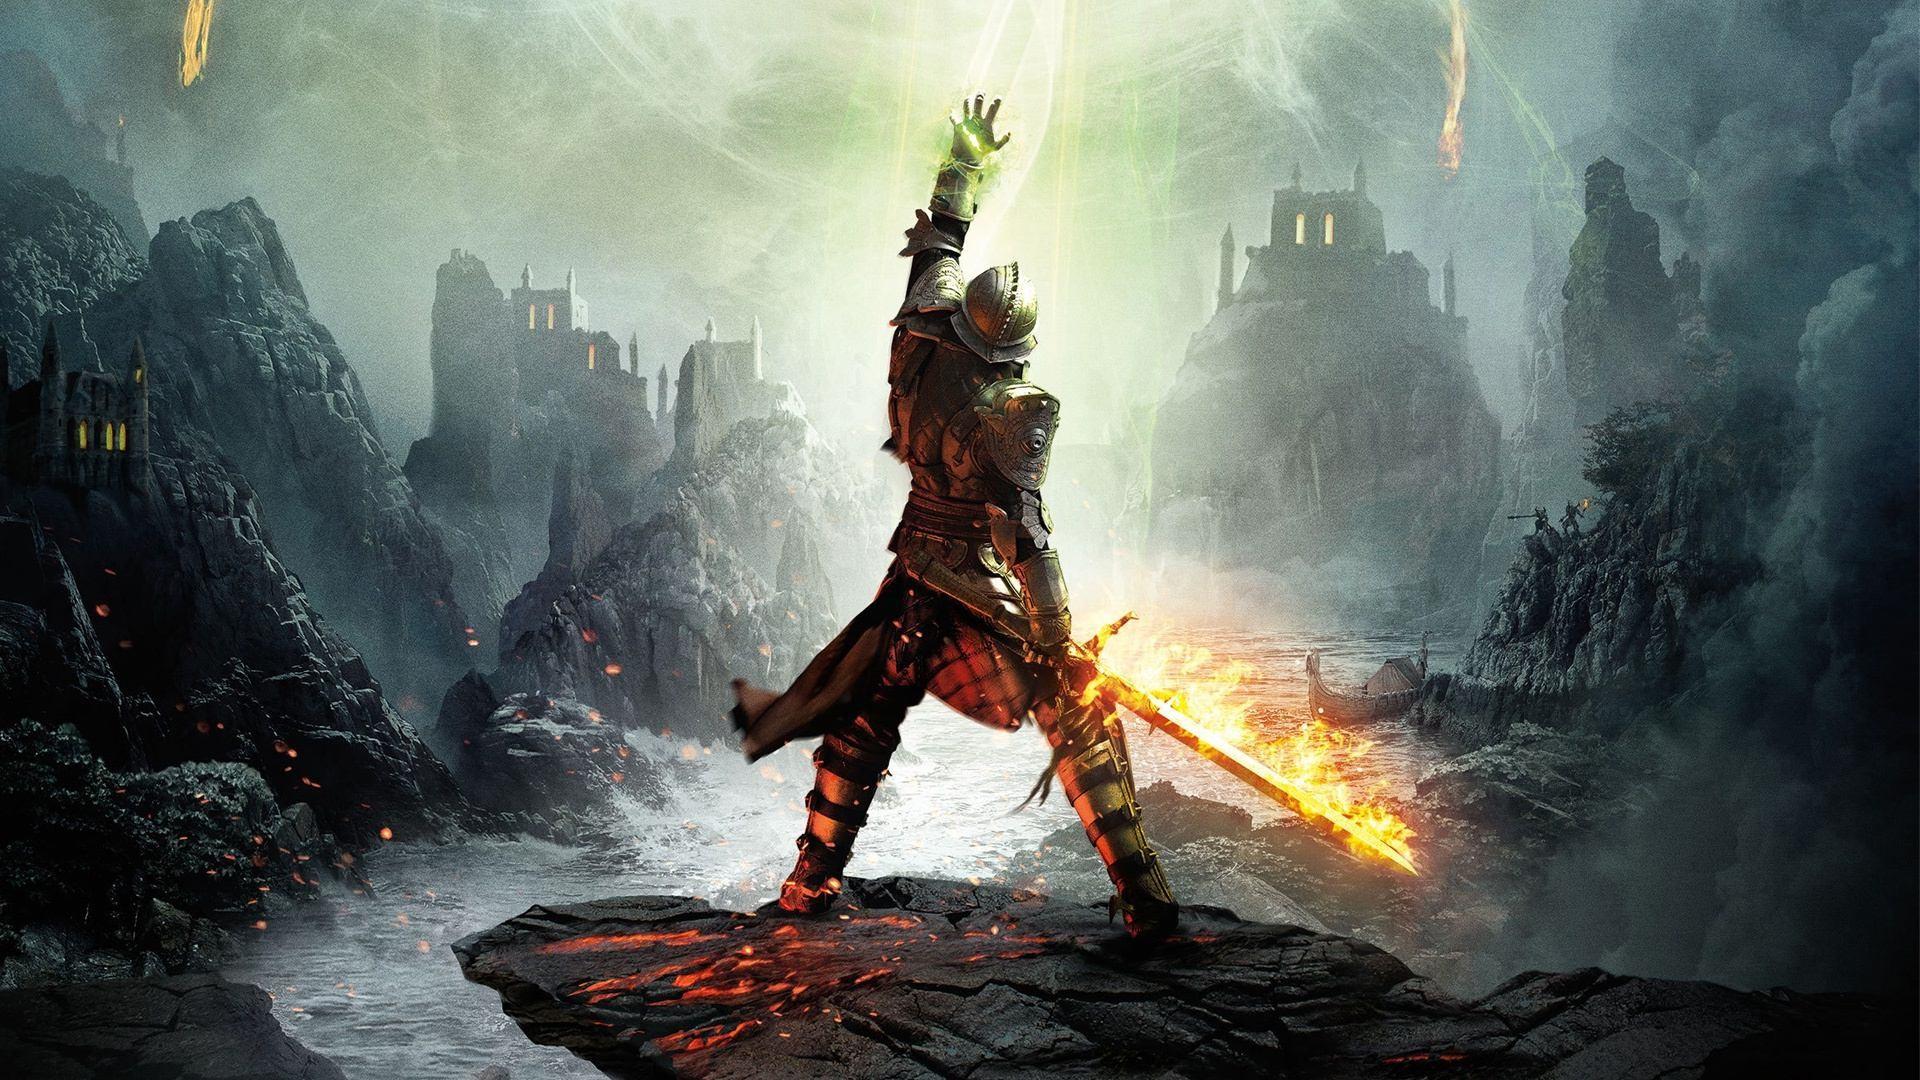 Wallpaper dragon age inquisition, warrior, dragon age, armor,  sword